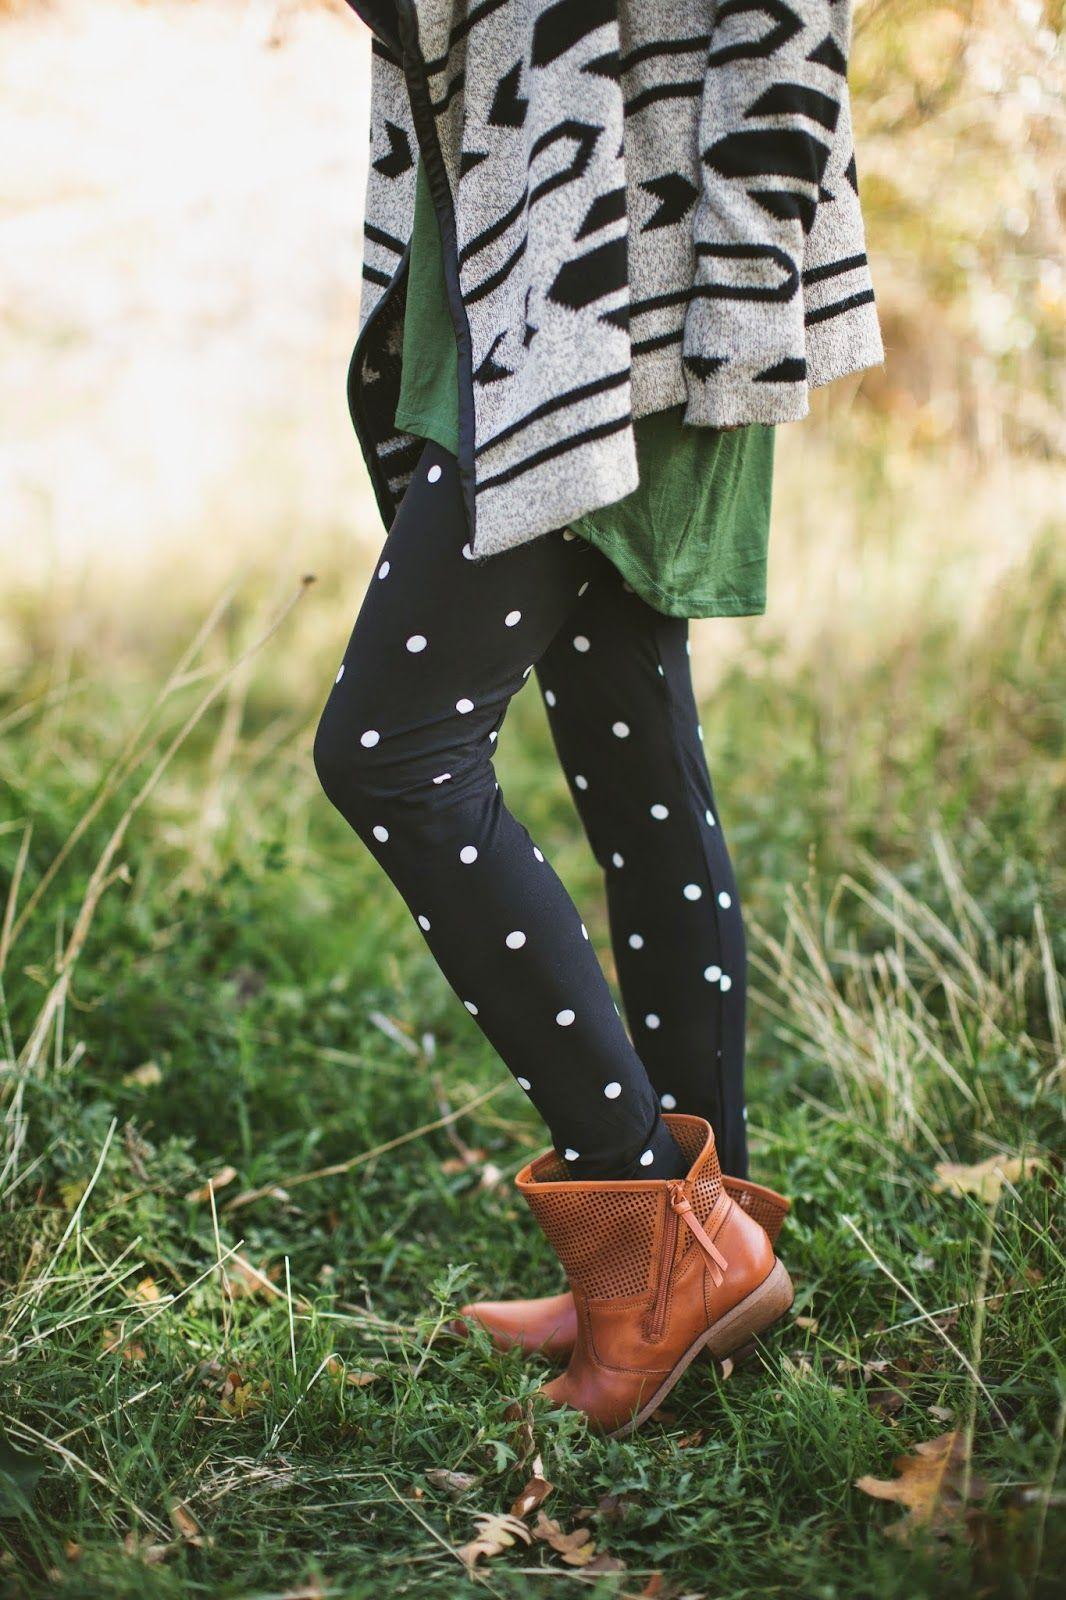 824efcf1d70ab Buttery soft, black and white, polka dot leggings. No one does leggings  quite